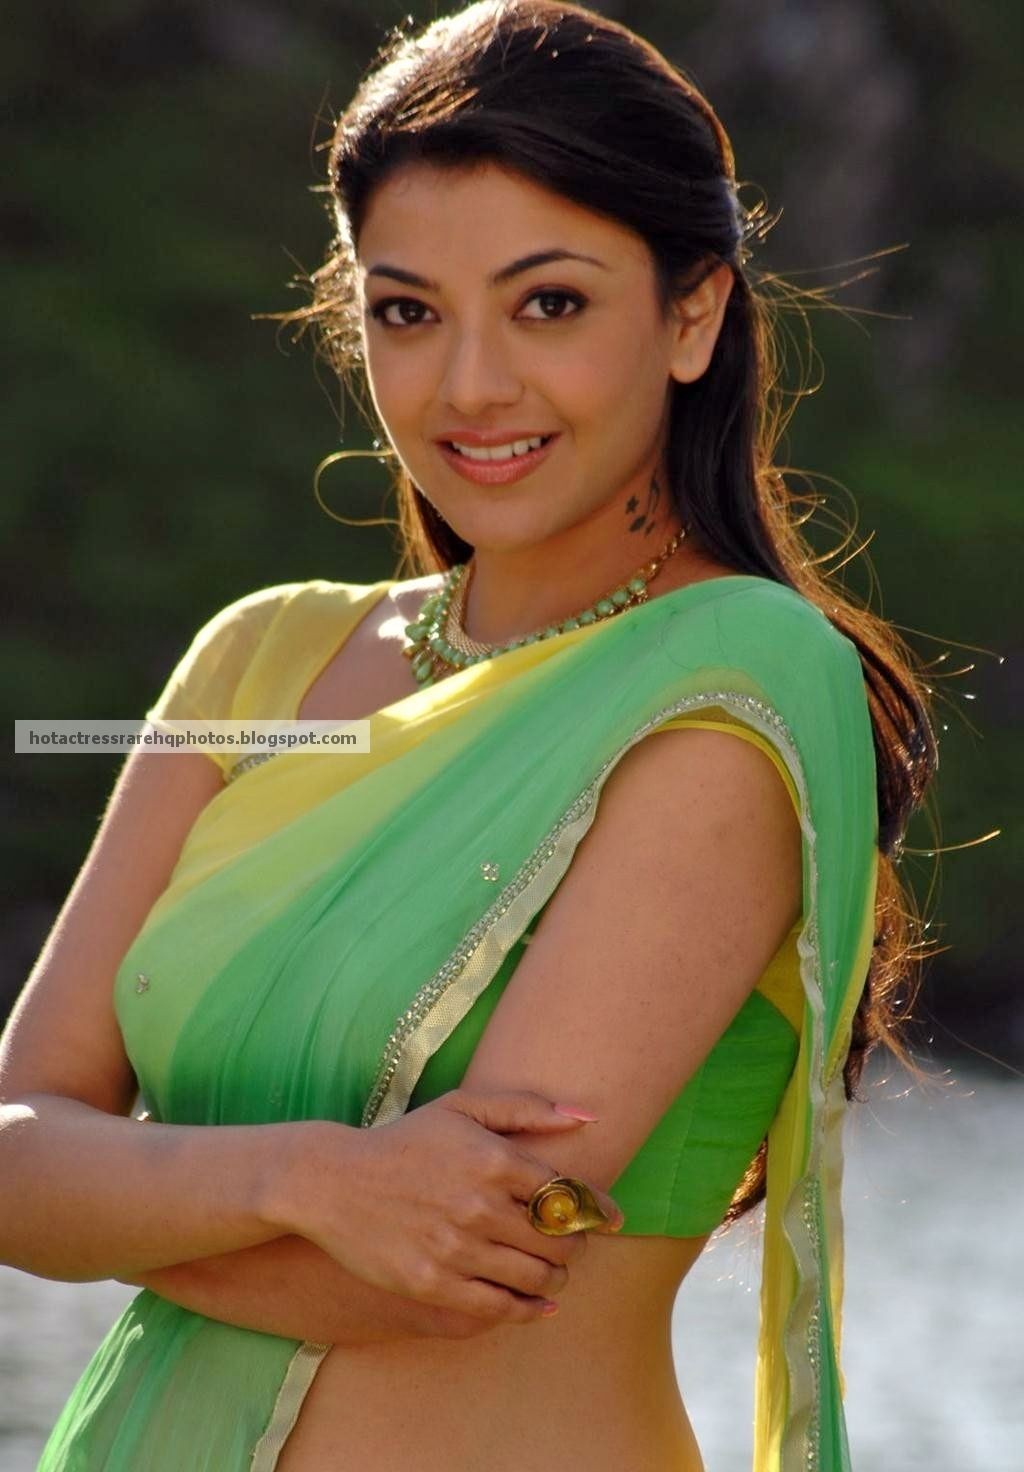 Kajal Agarwal Saree Stills From Thuppakki Movie 2 Jpg 1024 1472